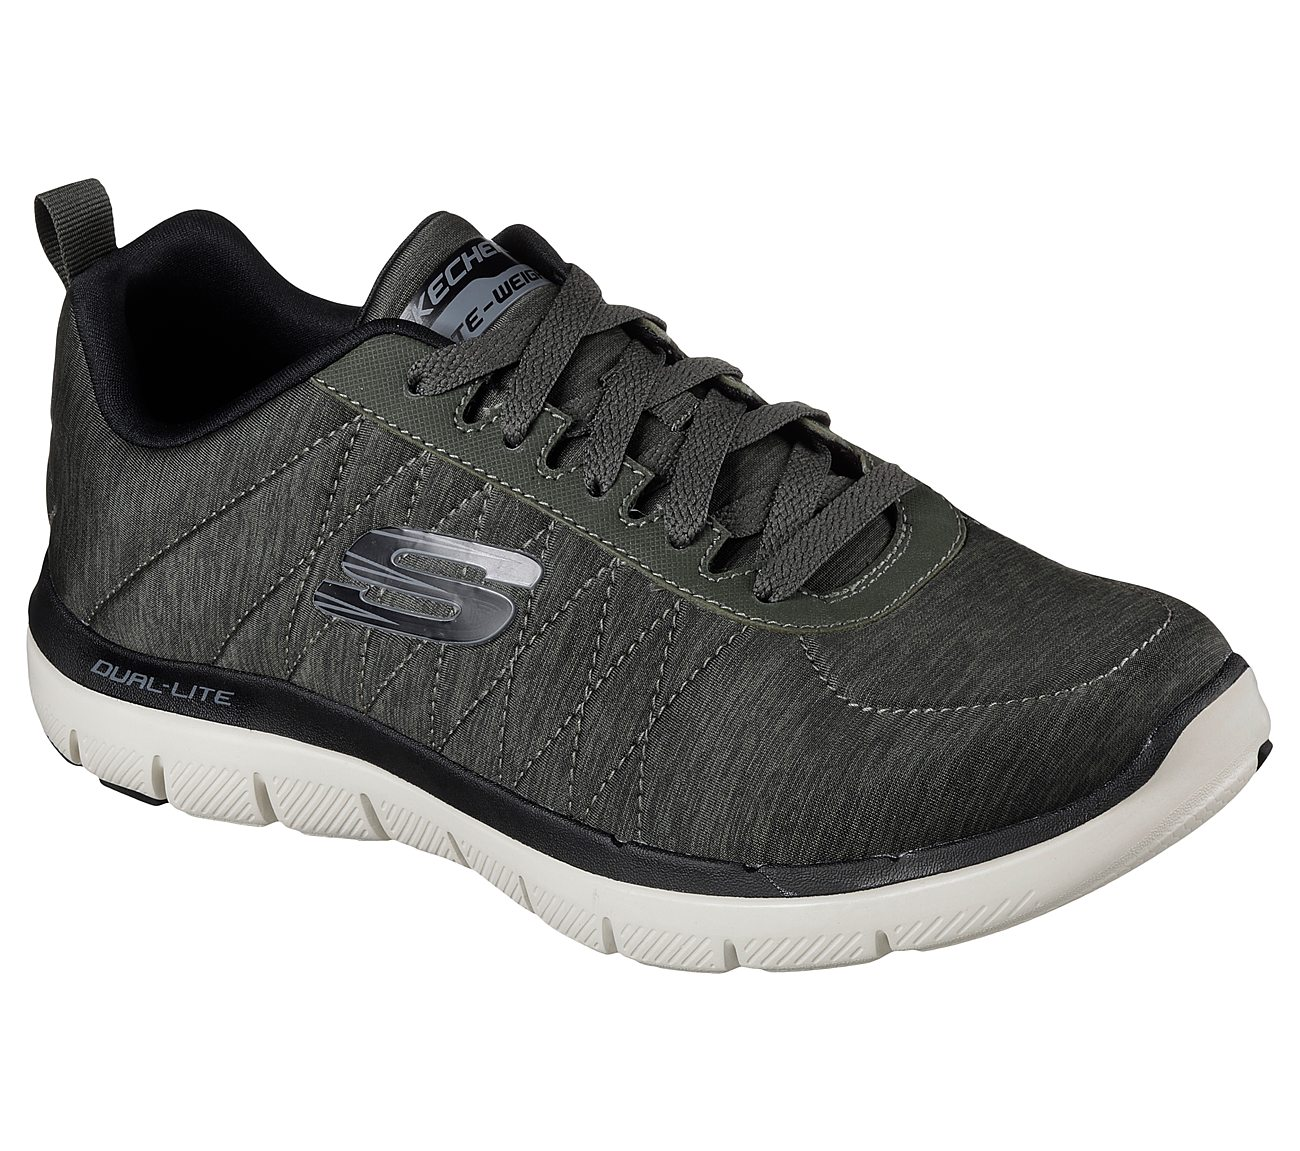 52186 SKECHERS SPORTS MAN   Shoes & Company